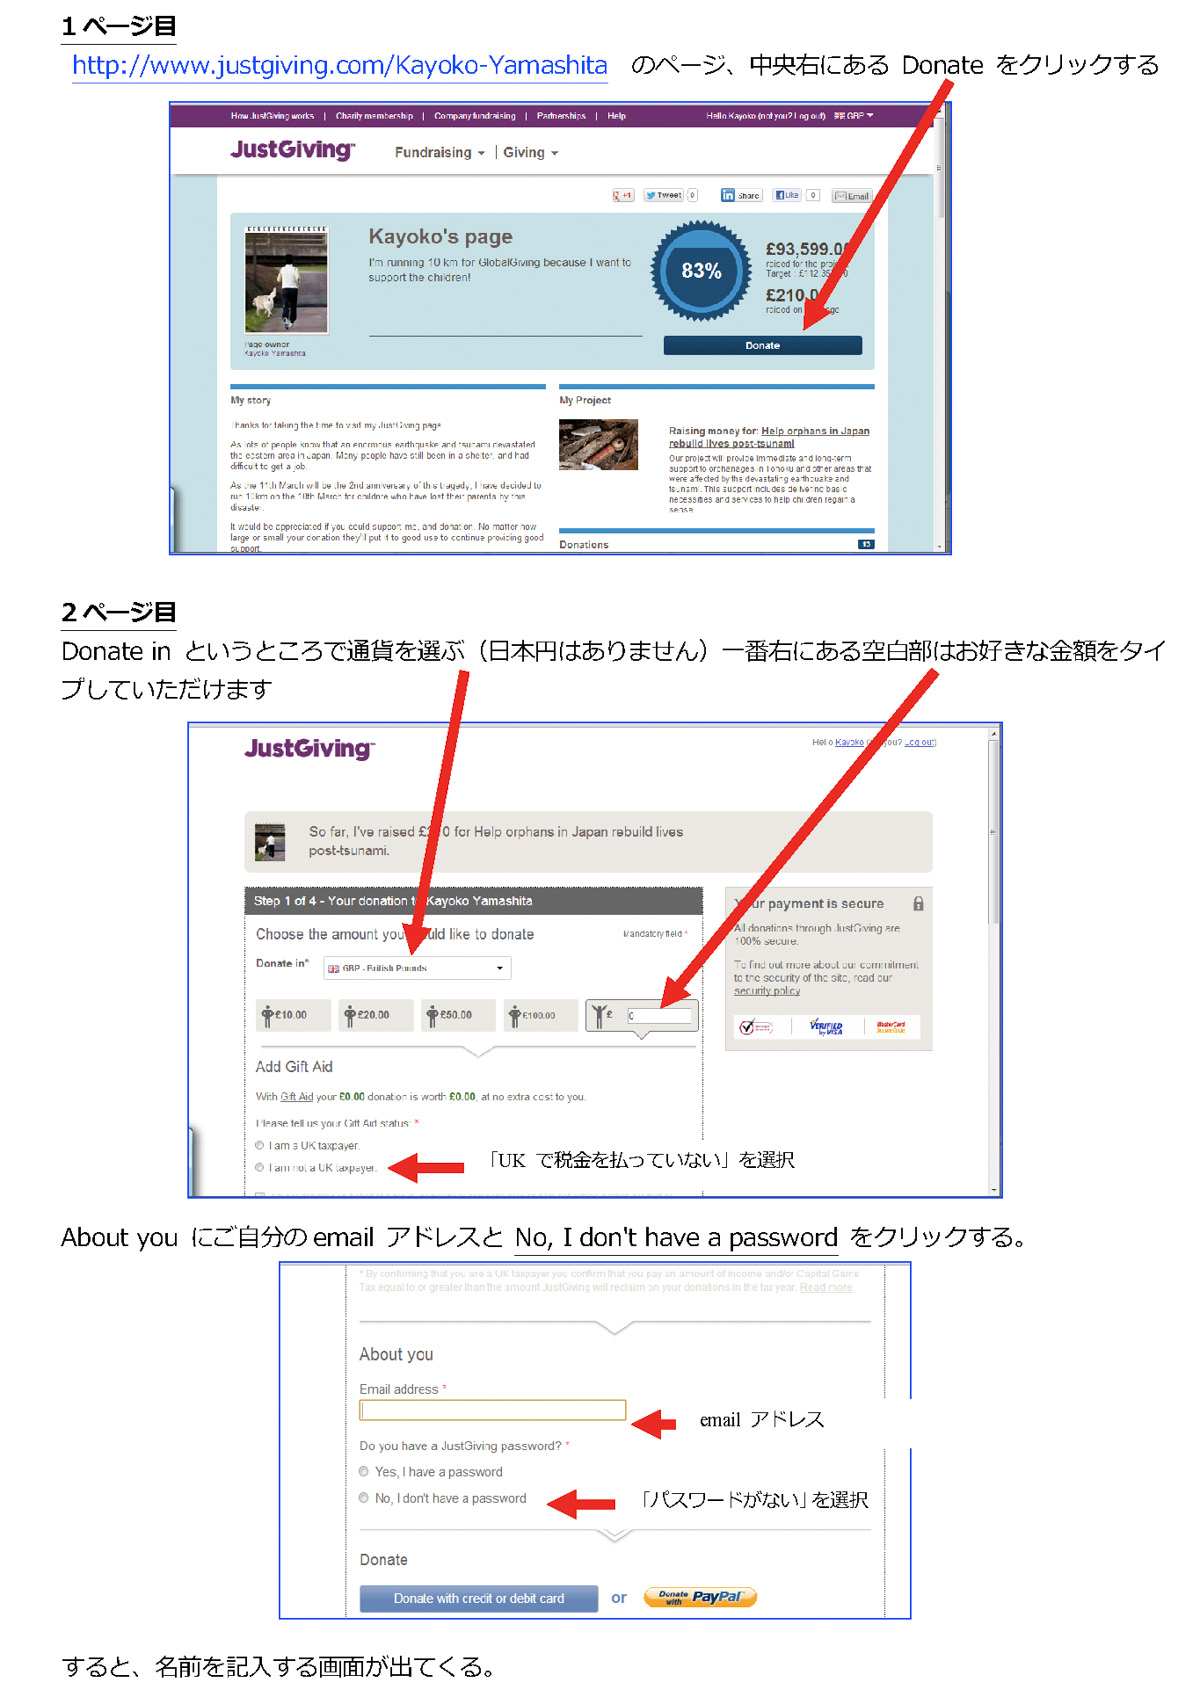 Donation_1.jpg